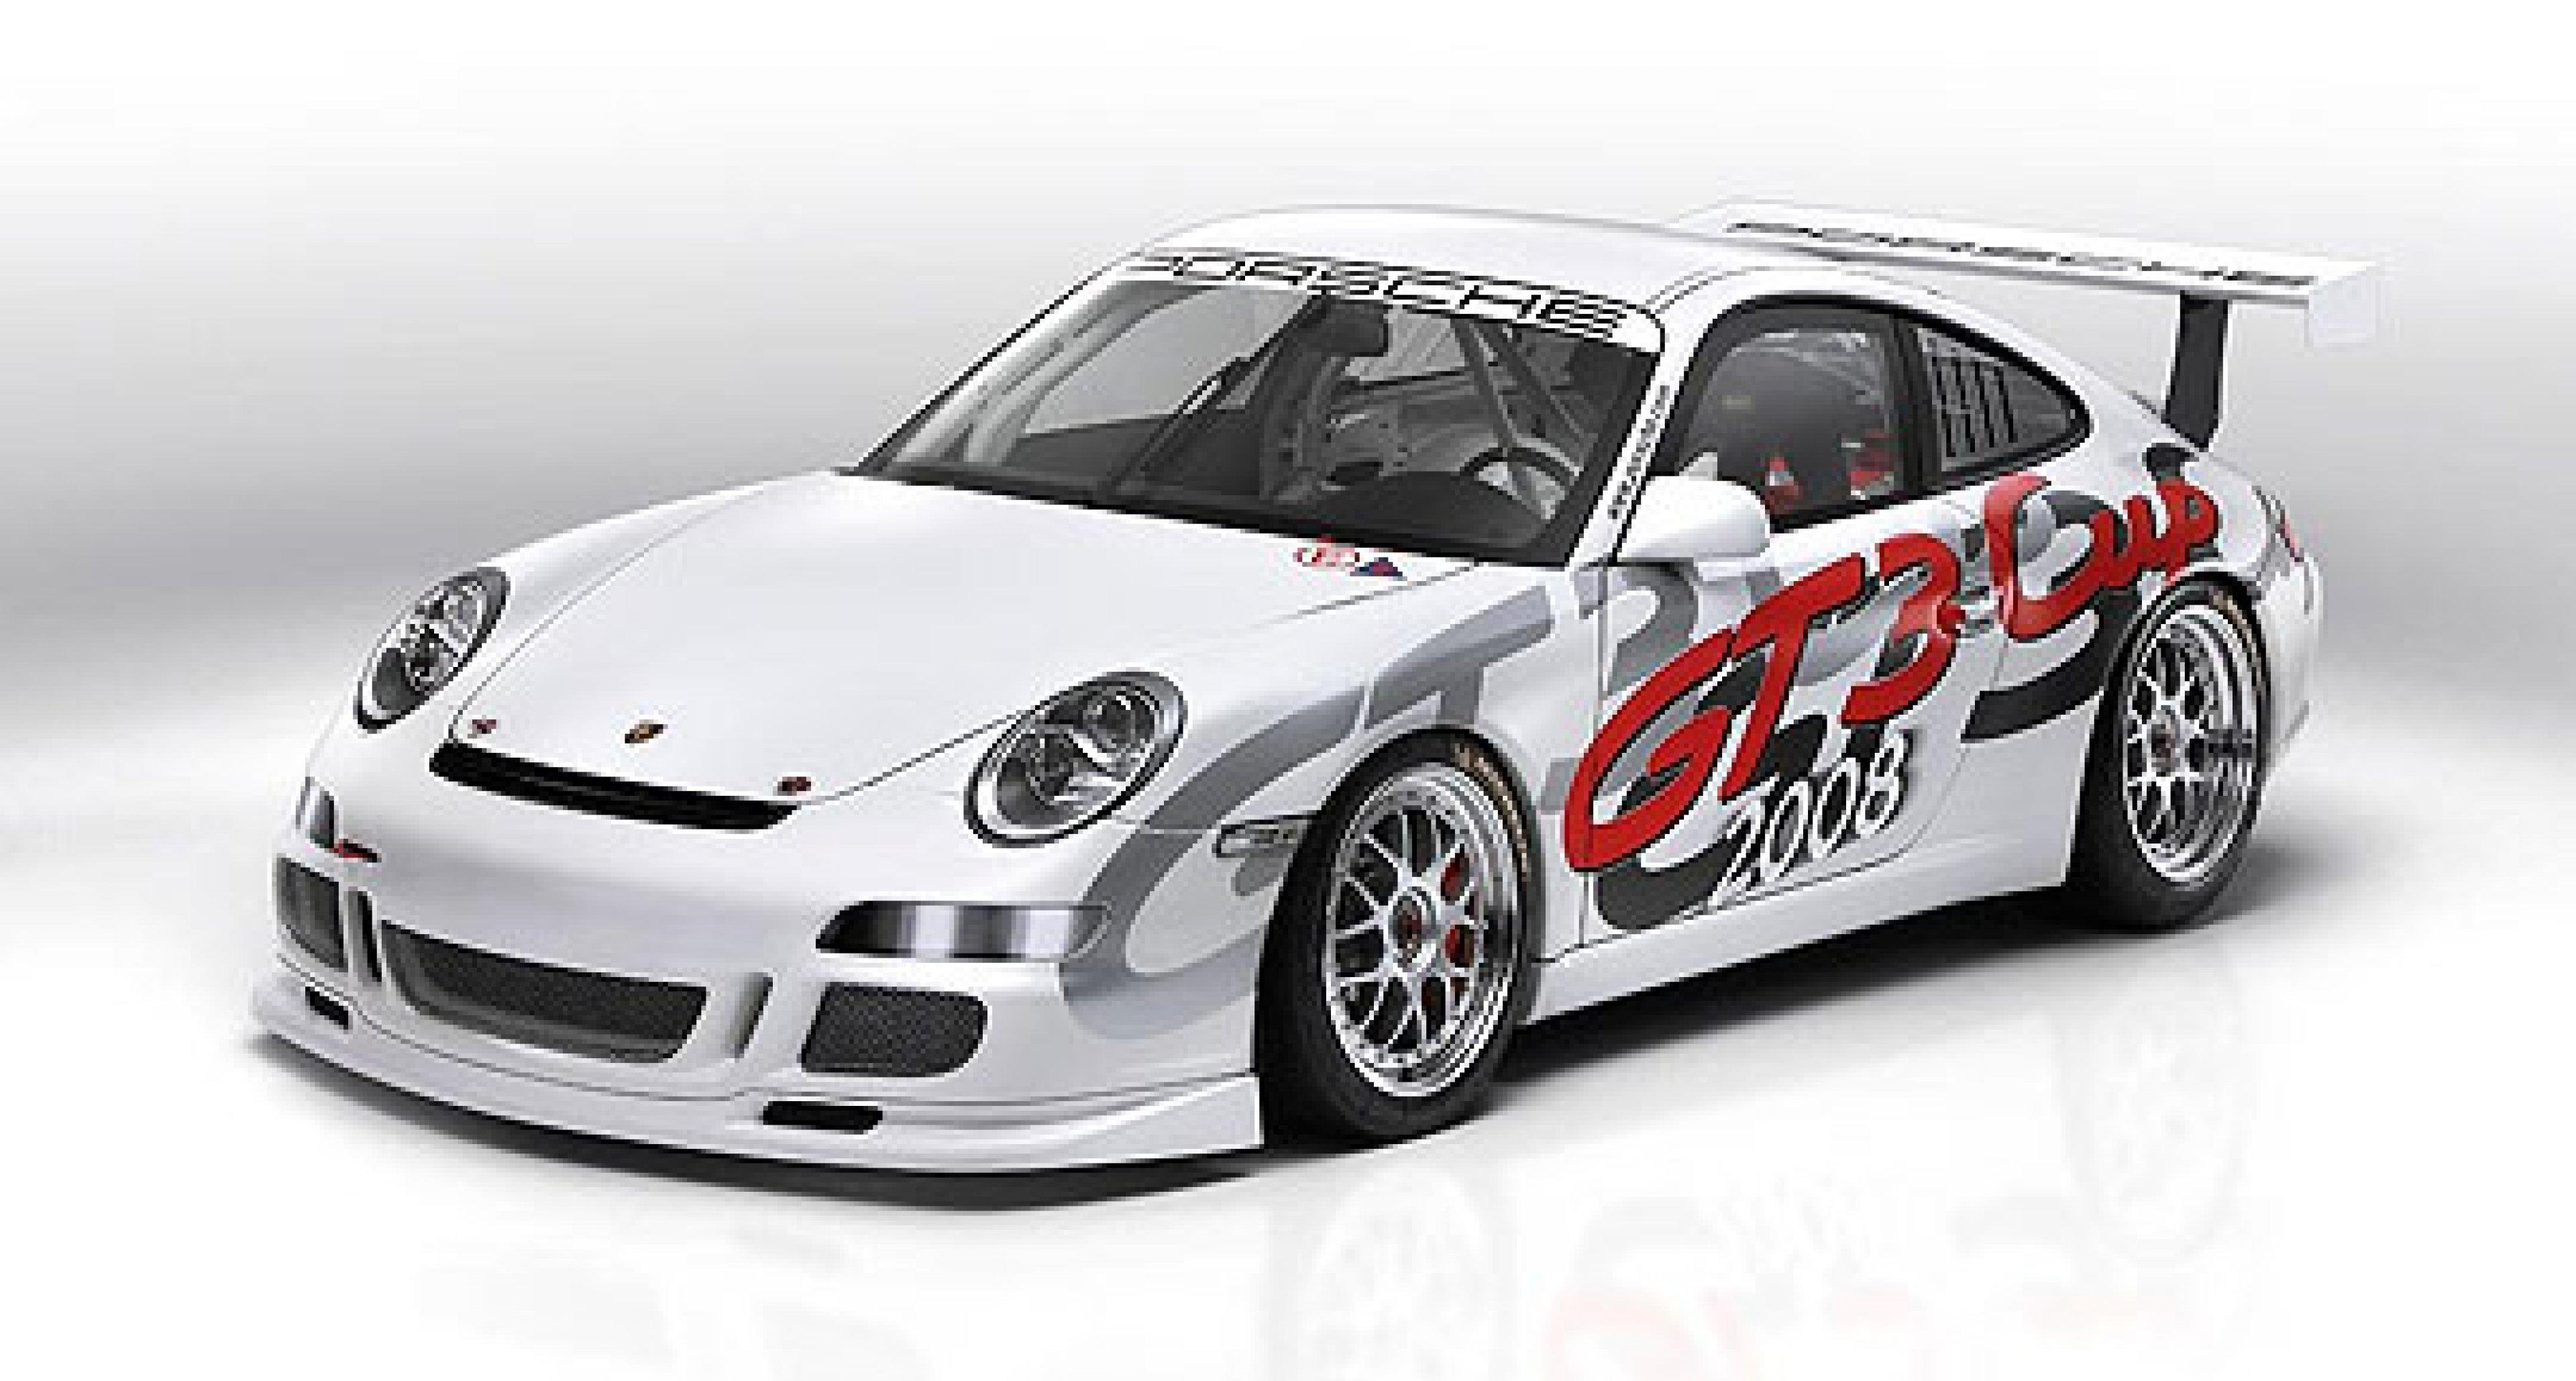 New 420bhp Porsche 911 GT3 Cup